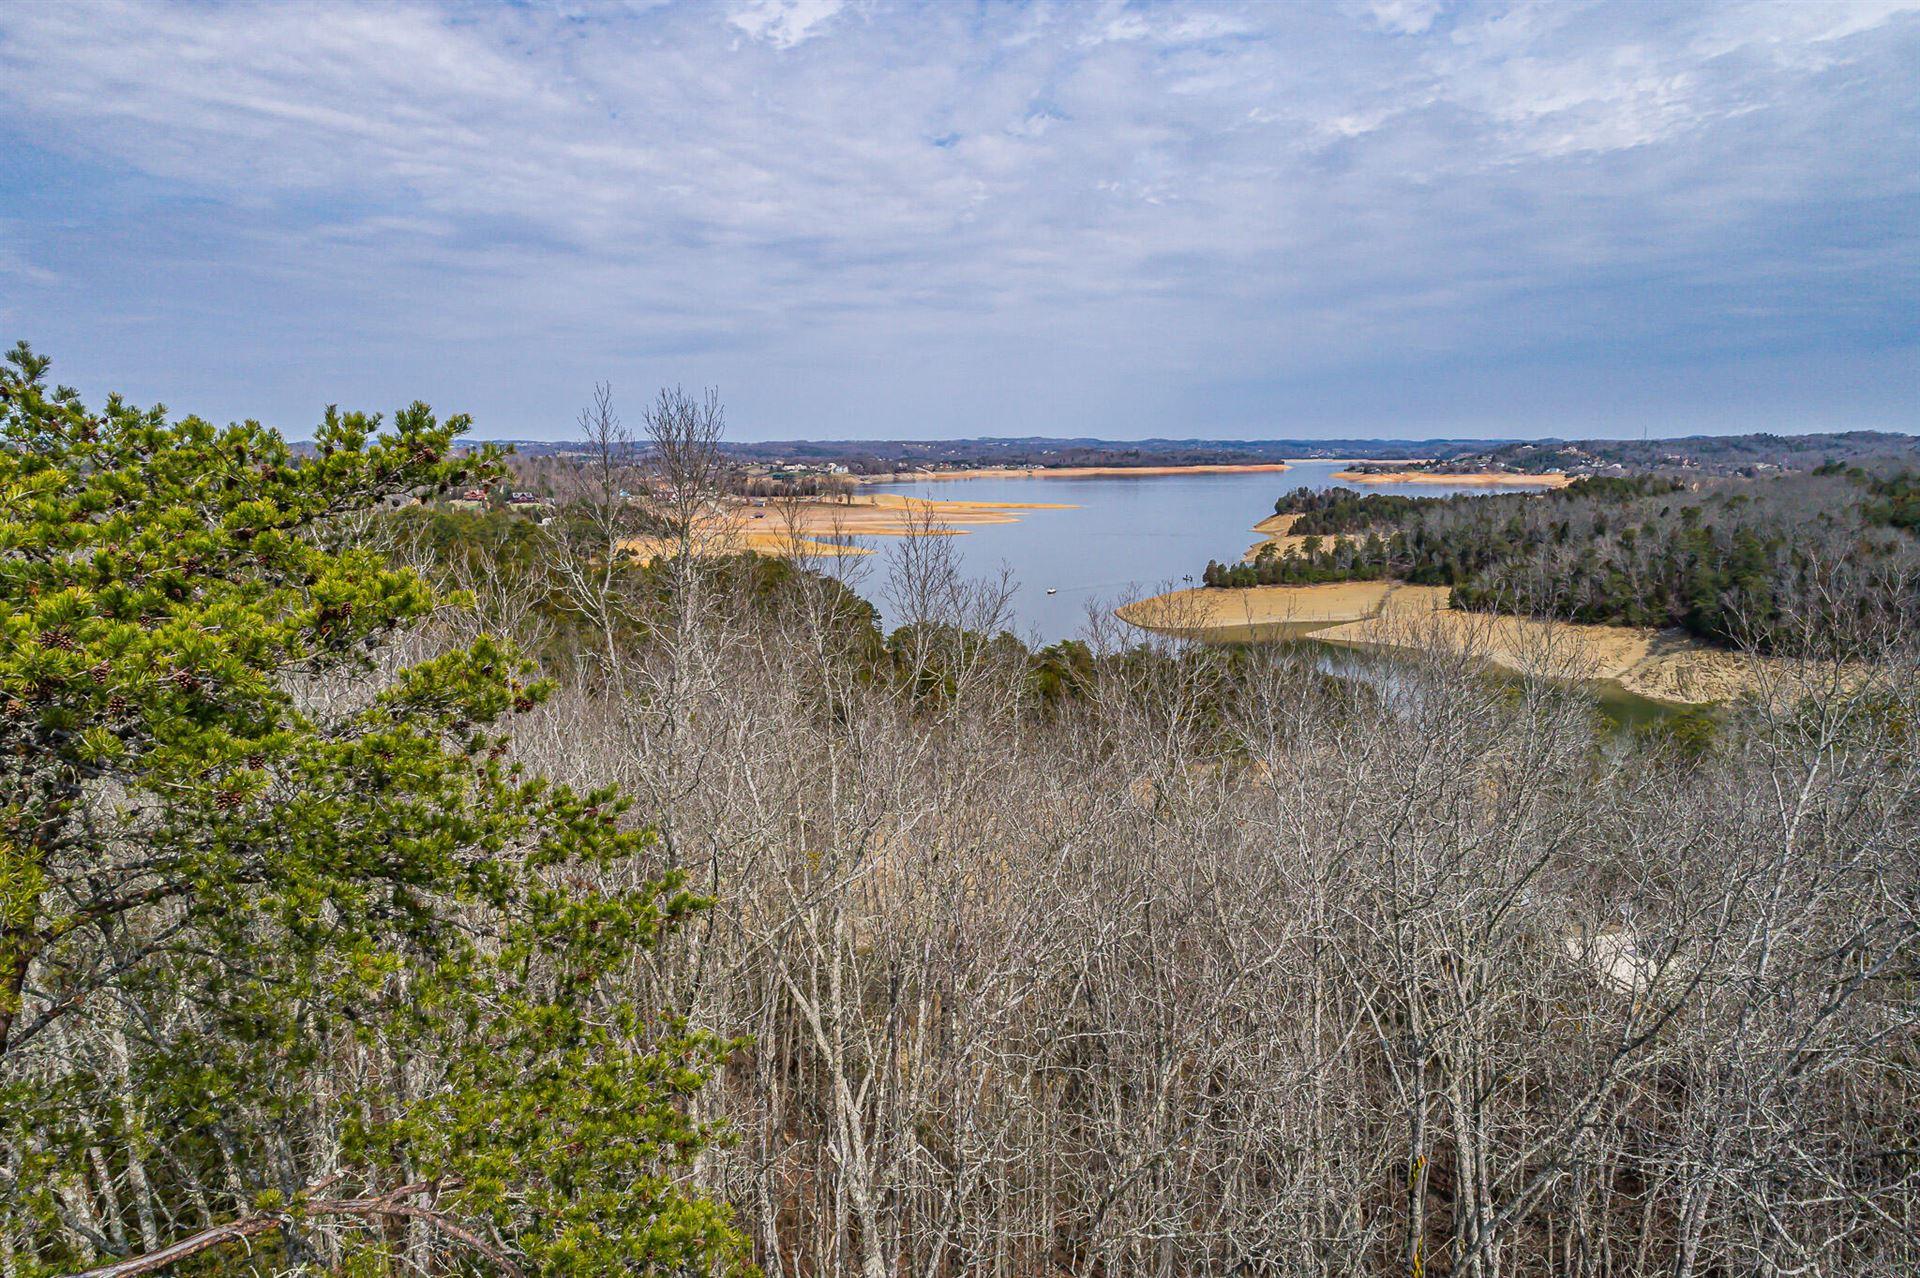 Photo of Lot 46 Emerald Pointe Blvd, Sevierville, TN 37876 (MLS # 1153057)